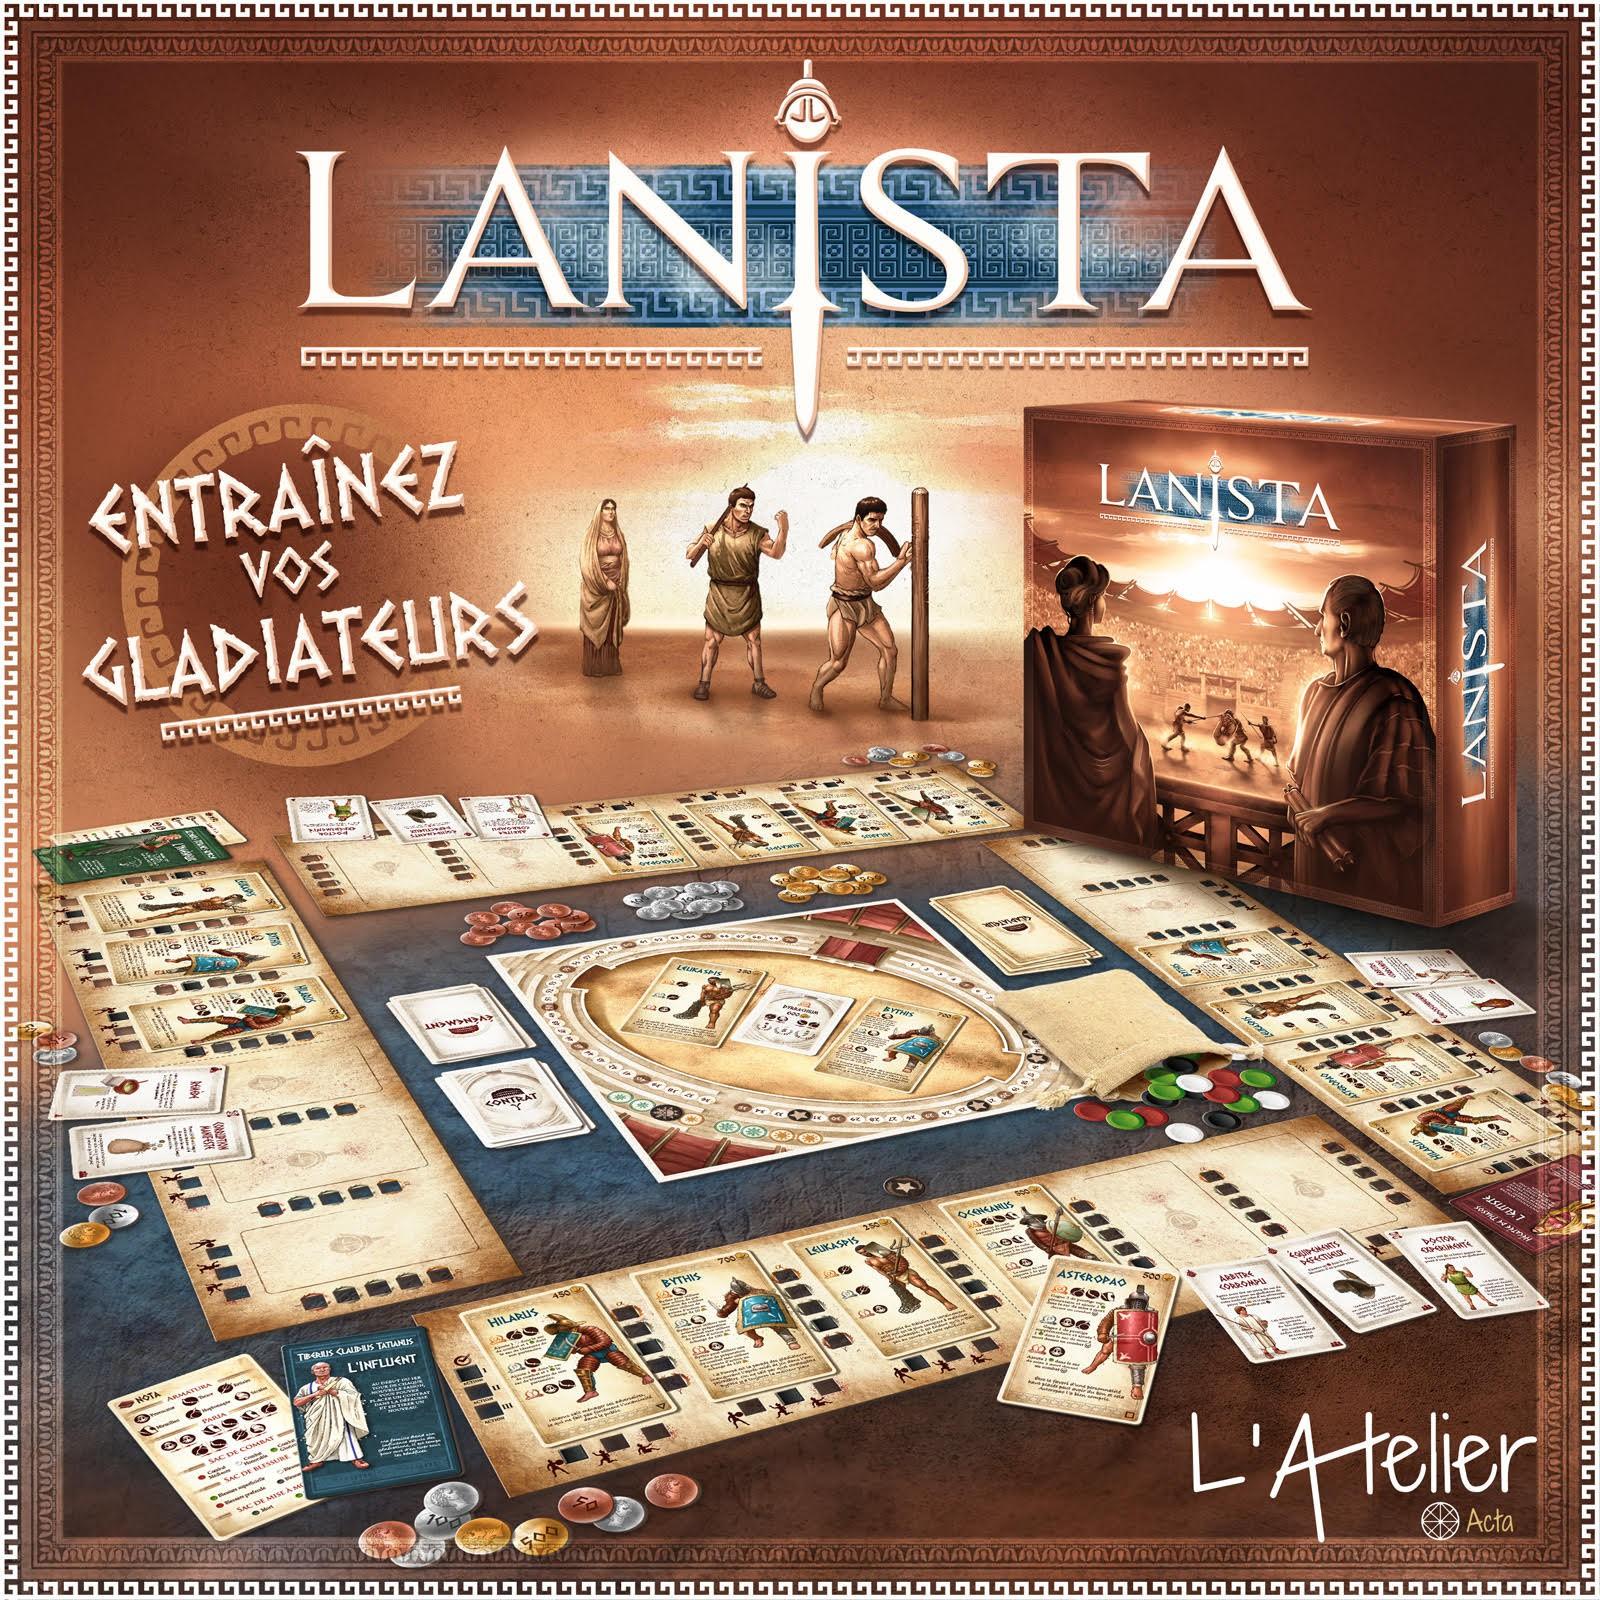 LANISTA : entraînez vos gladiateurs !